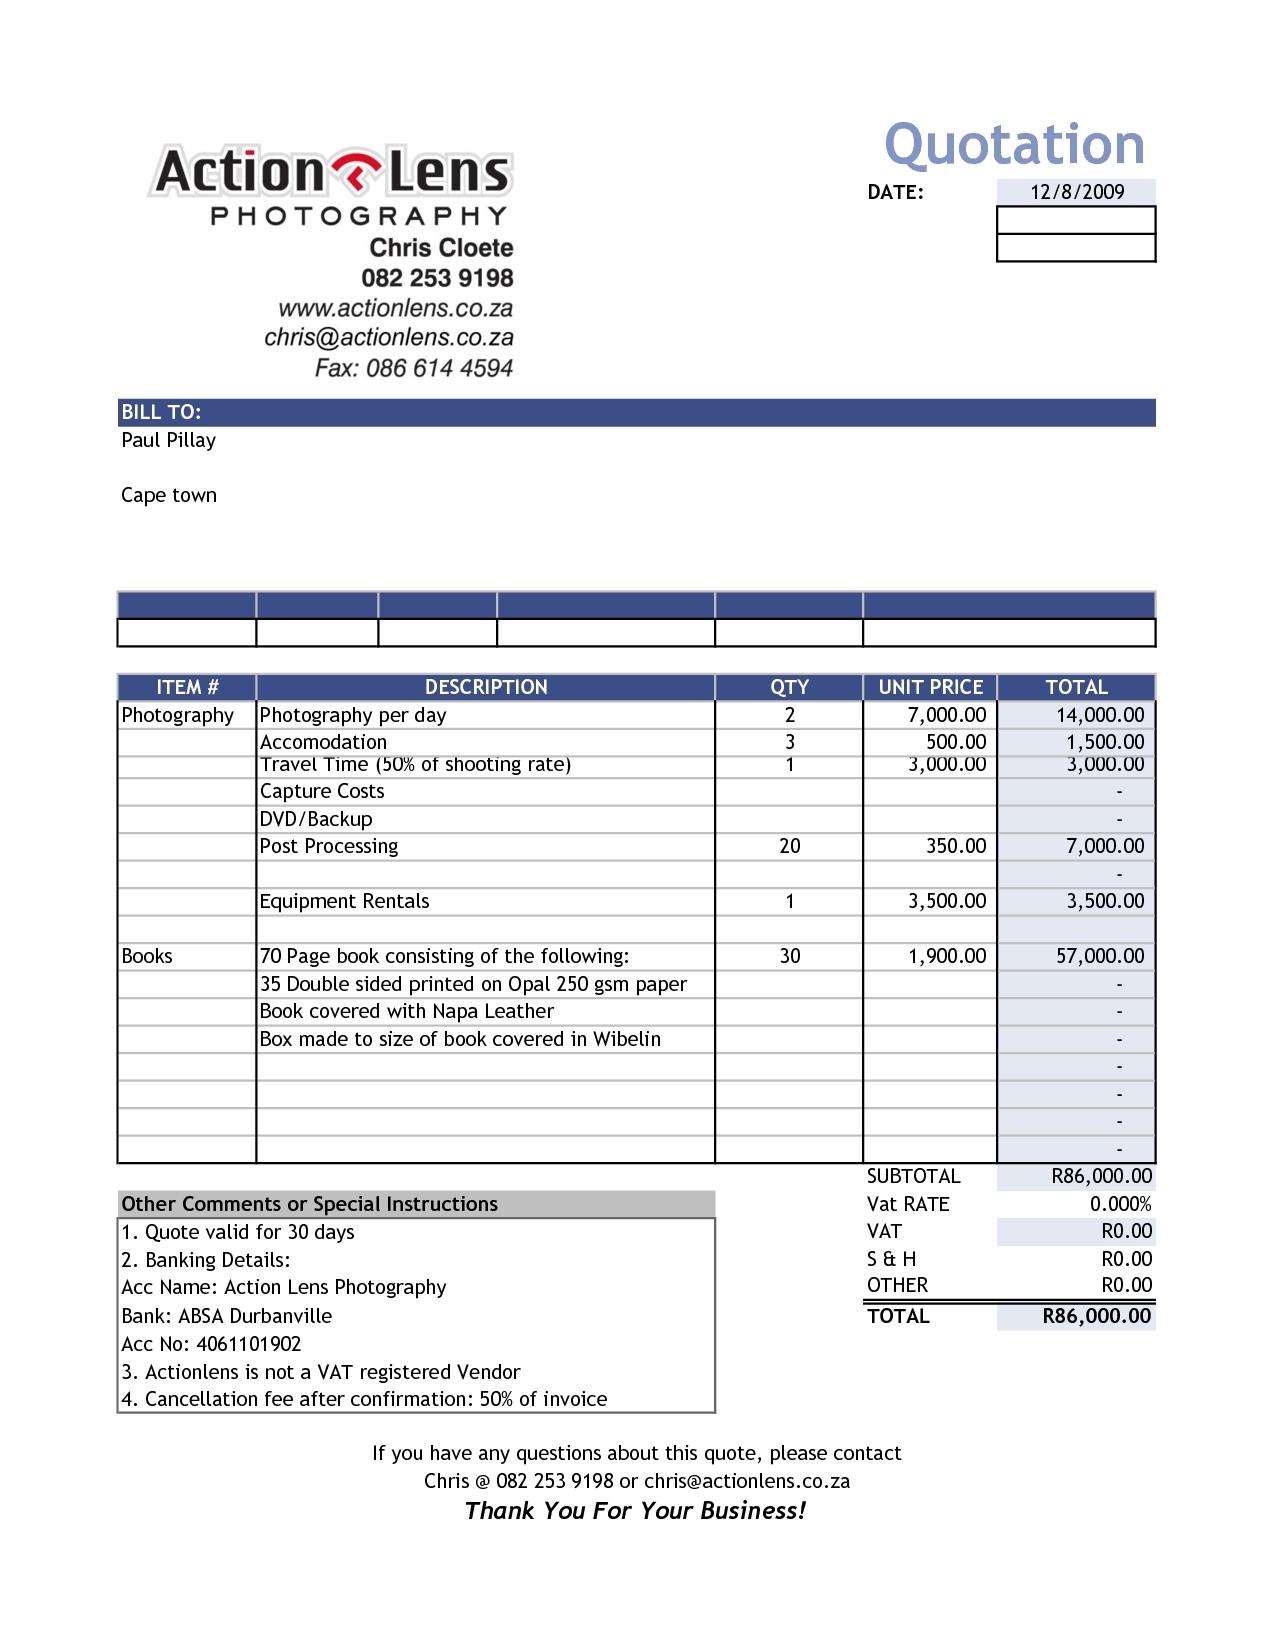 sale invoice template sale invoice format invoice template free 2016 1275 X 1650